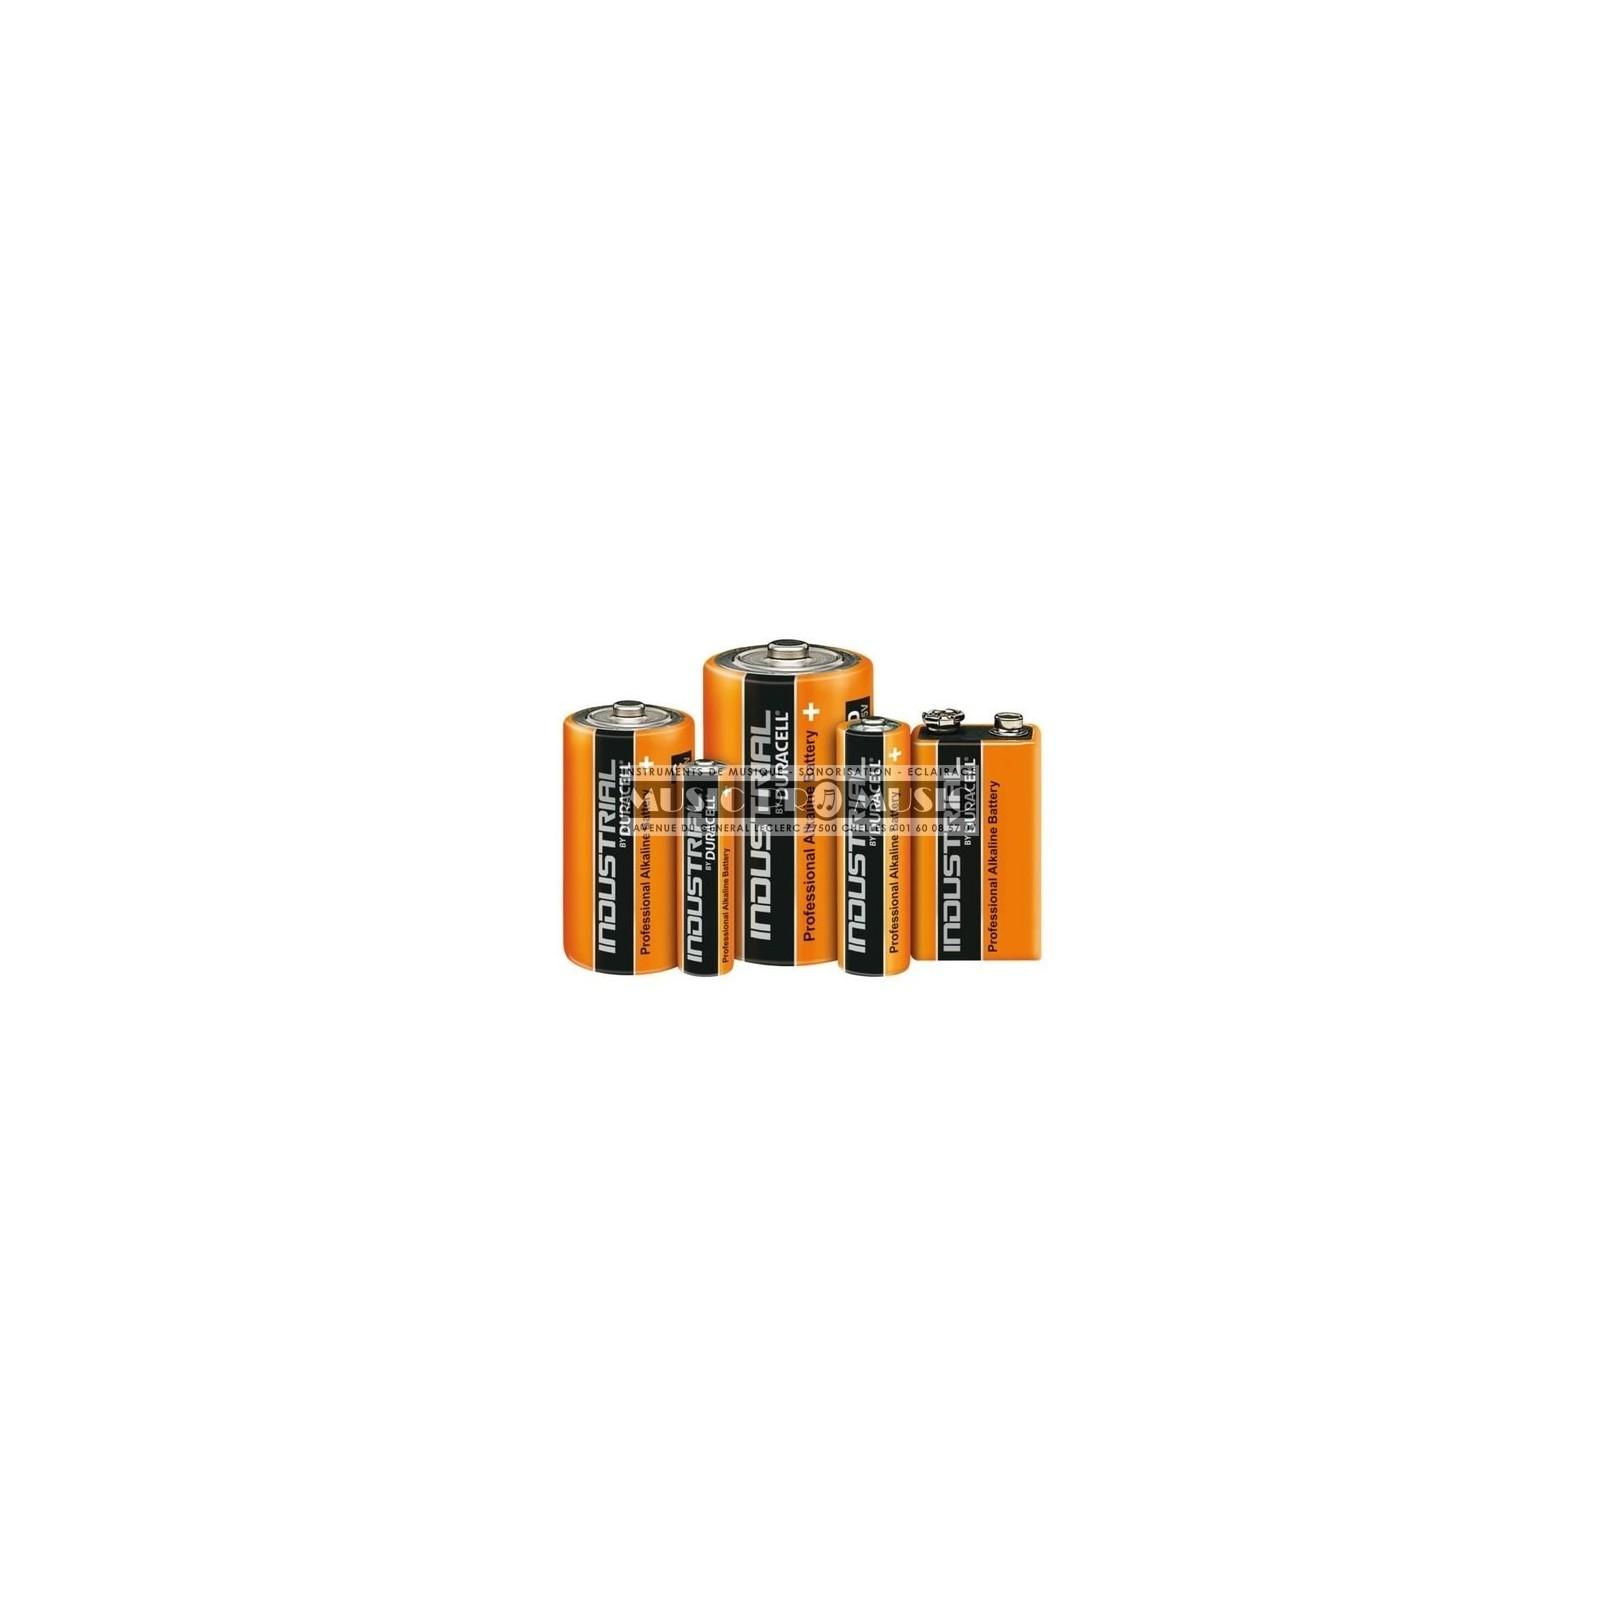 Duracell industrial lr20 pile 1 5v d - Pile 1 5v ...